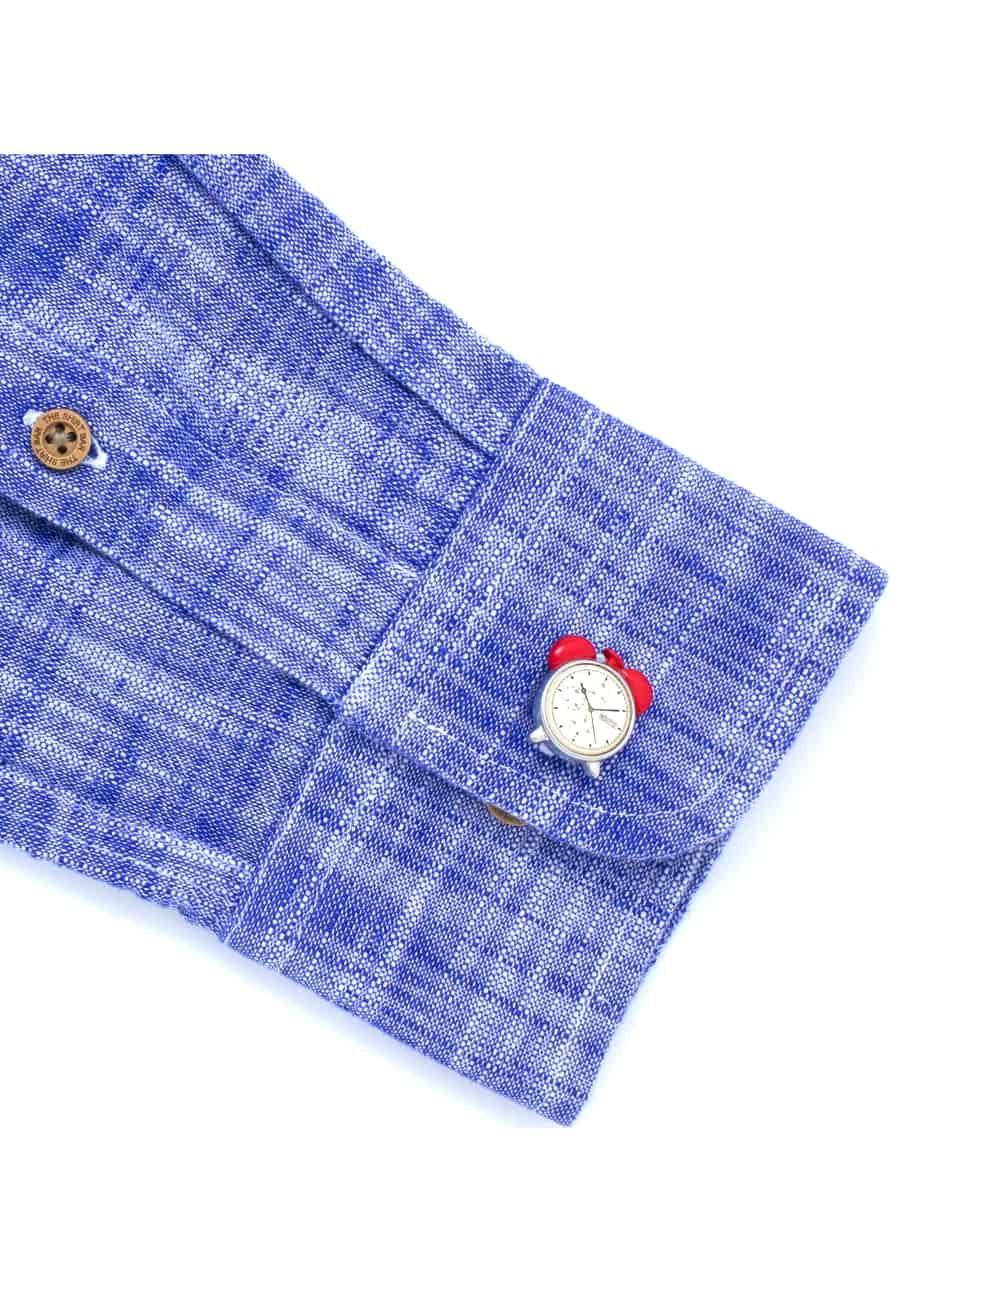 Relaxed Fit Blue Button Down 100% Cotton Long Sleeve Shirt RF6BA2.7